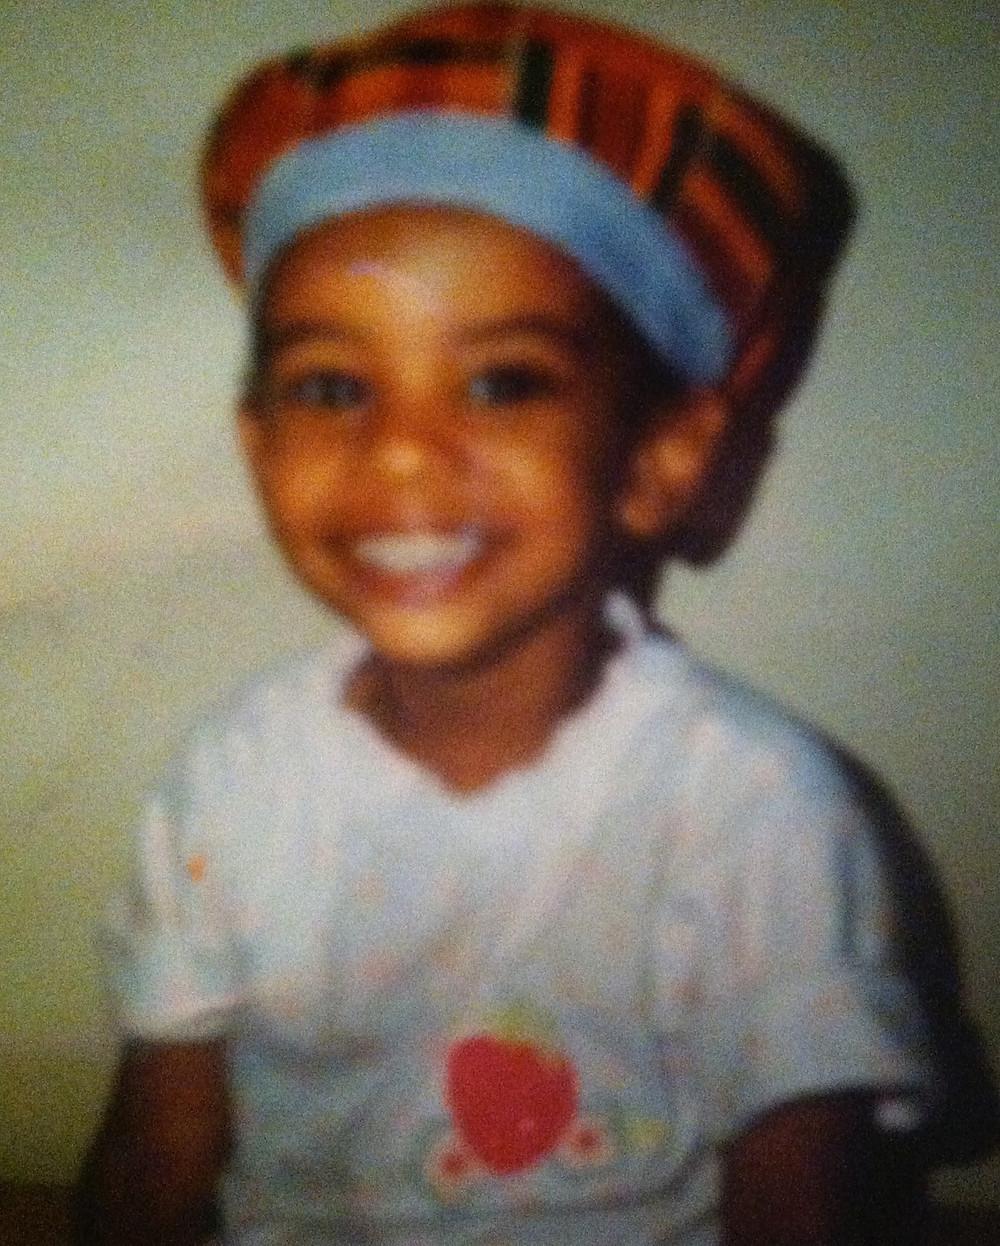 Baby ShanMichele wearing a Kente Cloth hat